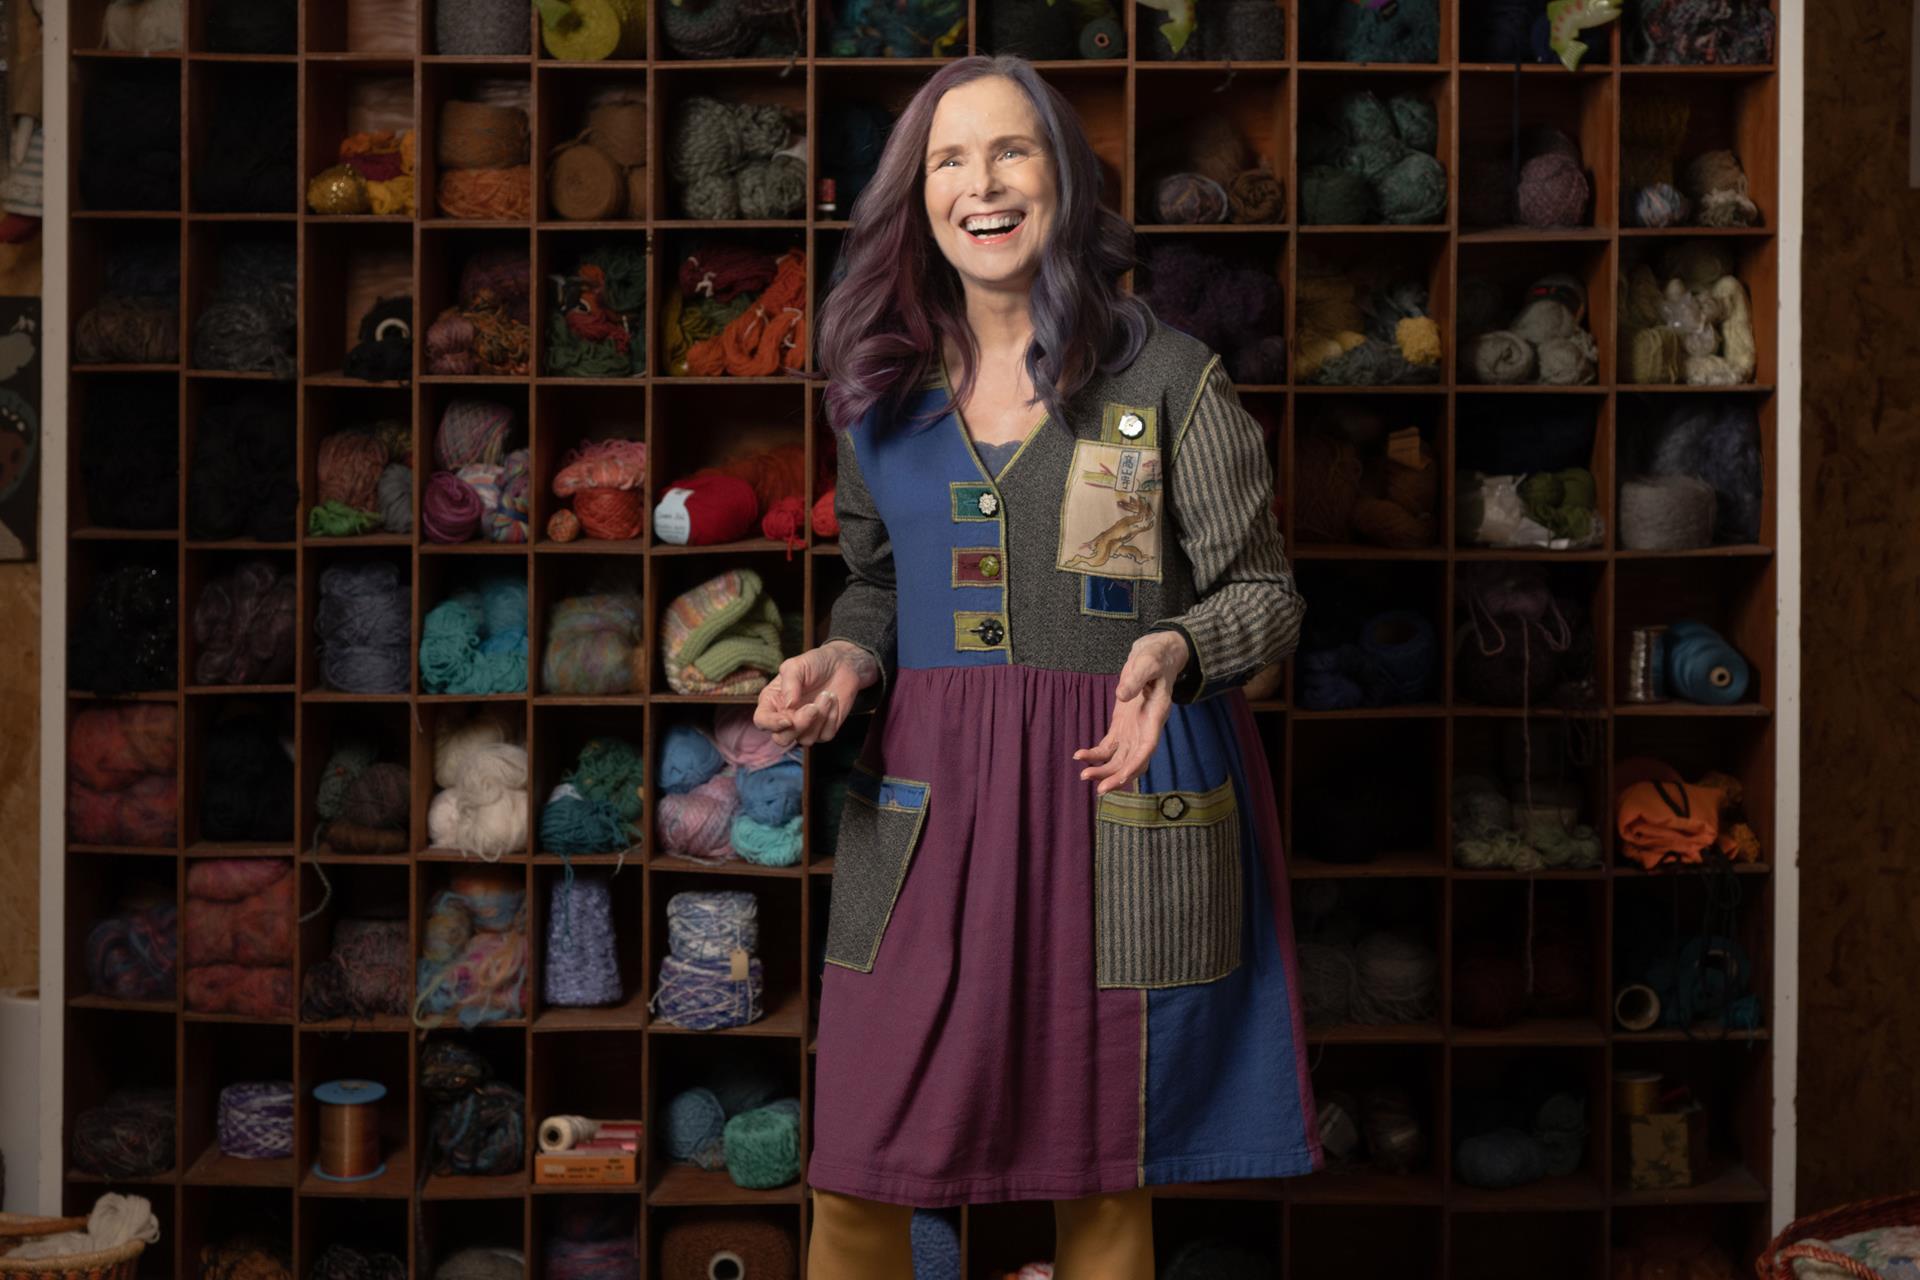 Molly Gordon - A Coach for Cultural Change